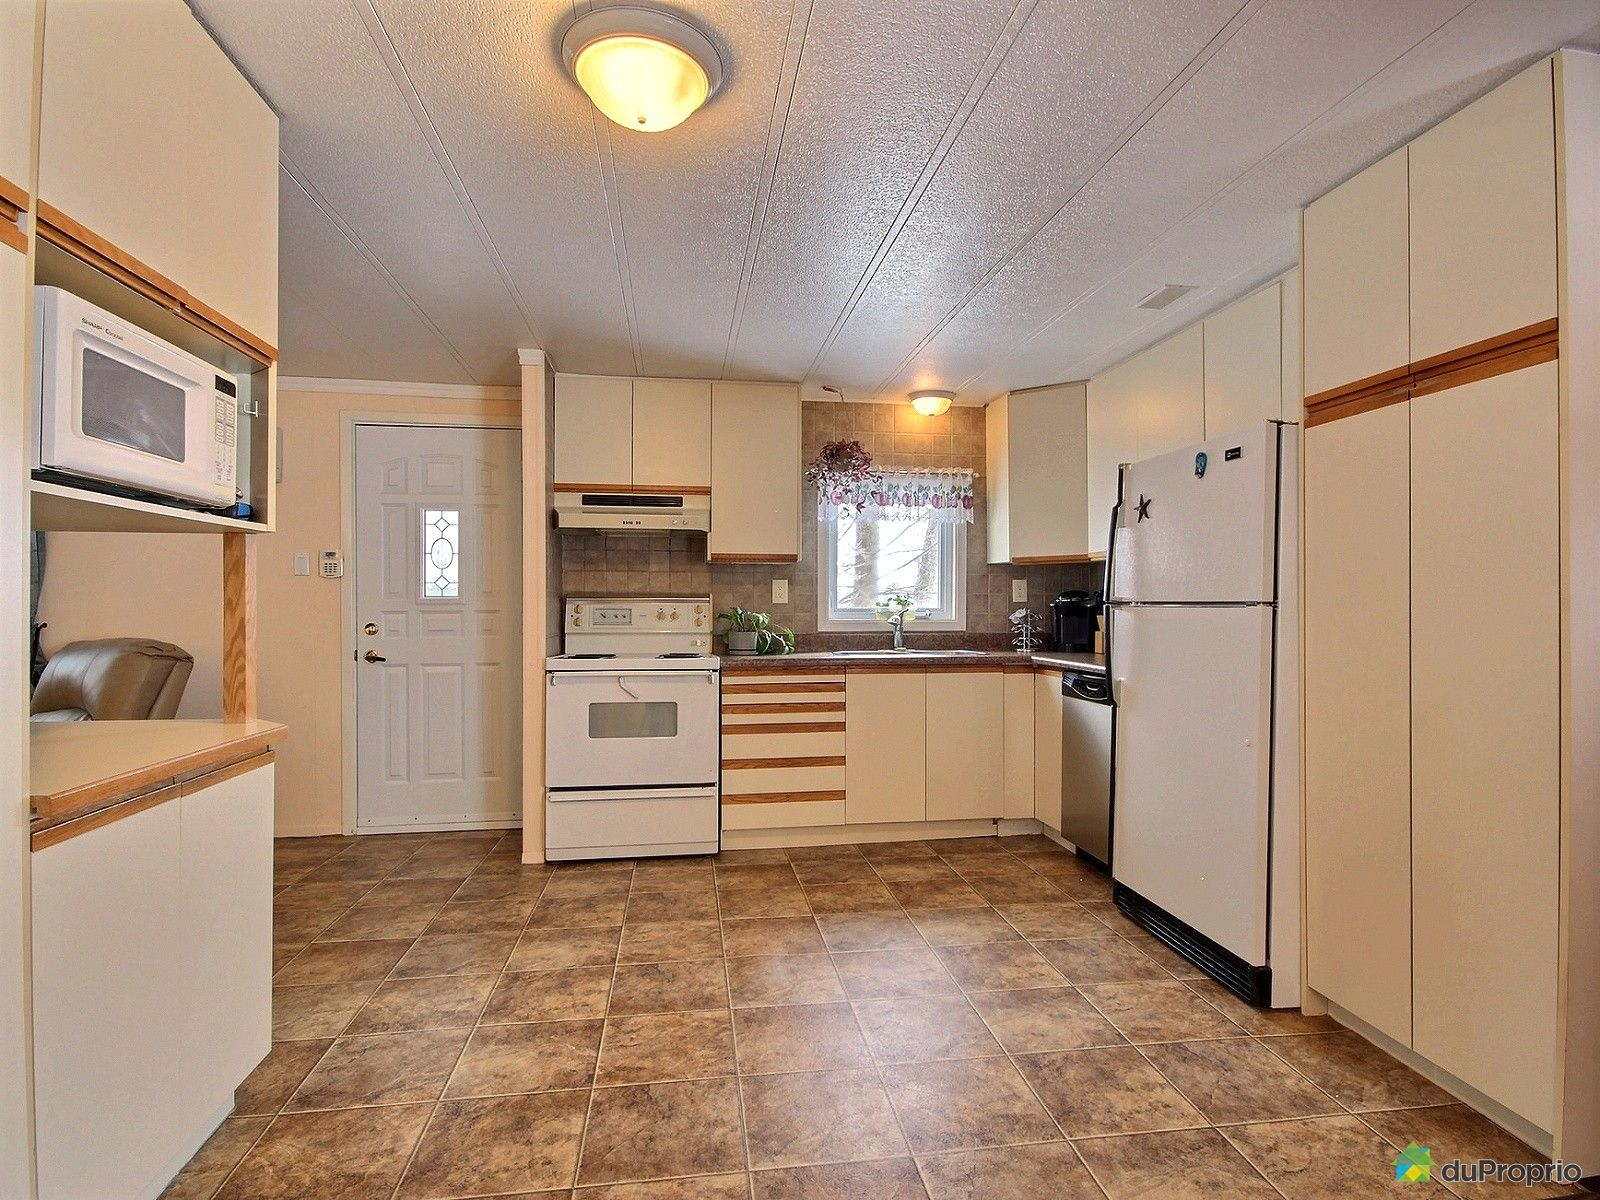 maison vendu st nicolas immobilier qu bec duproprio 691792. Black Bedroom Furniture Sets. Home Design Ideas